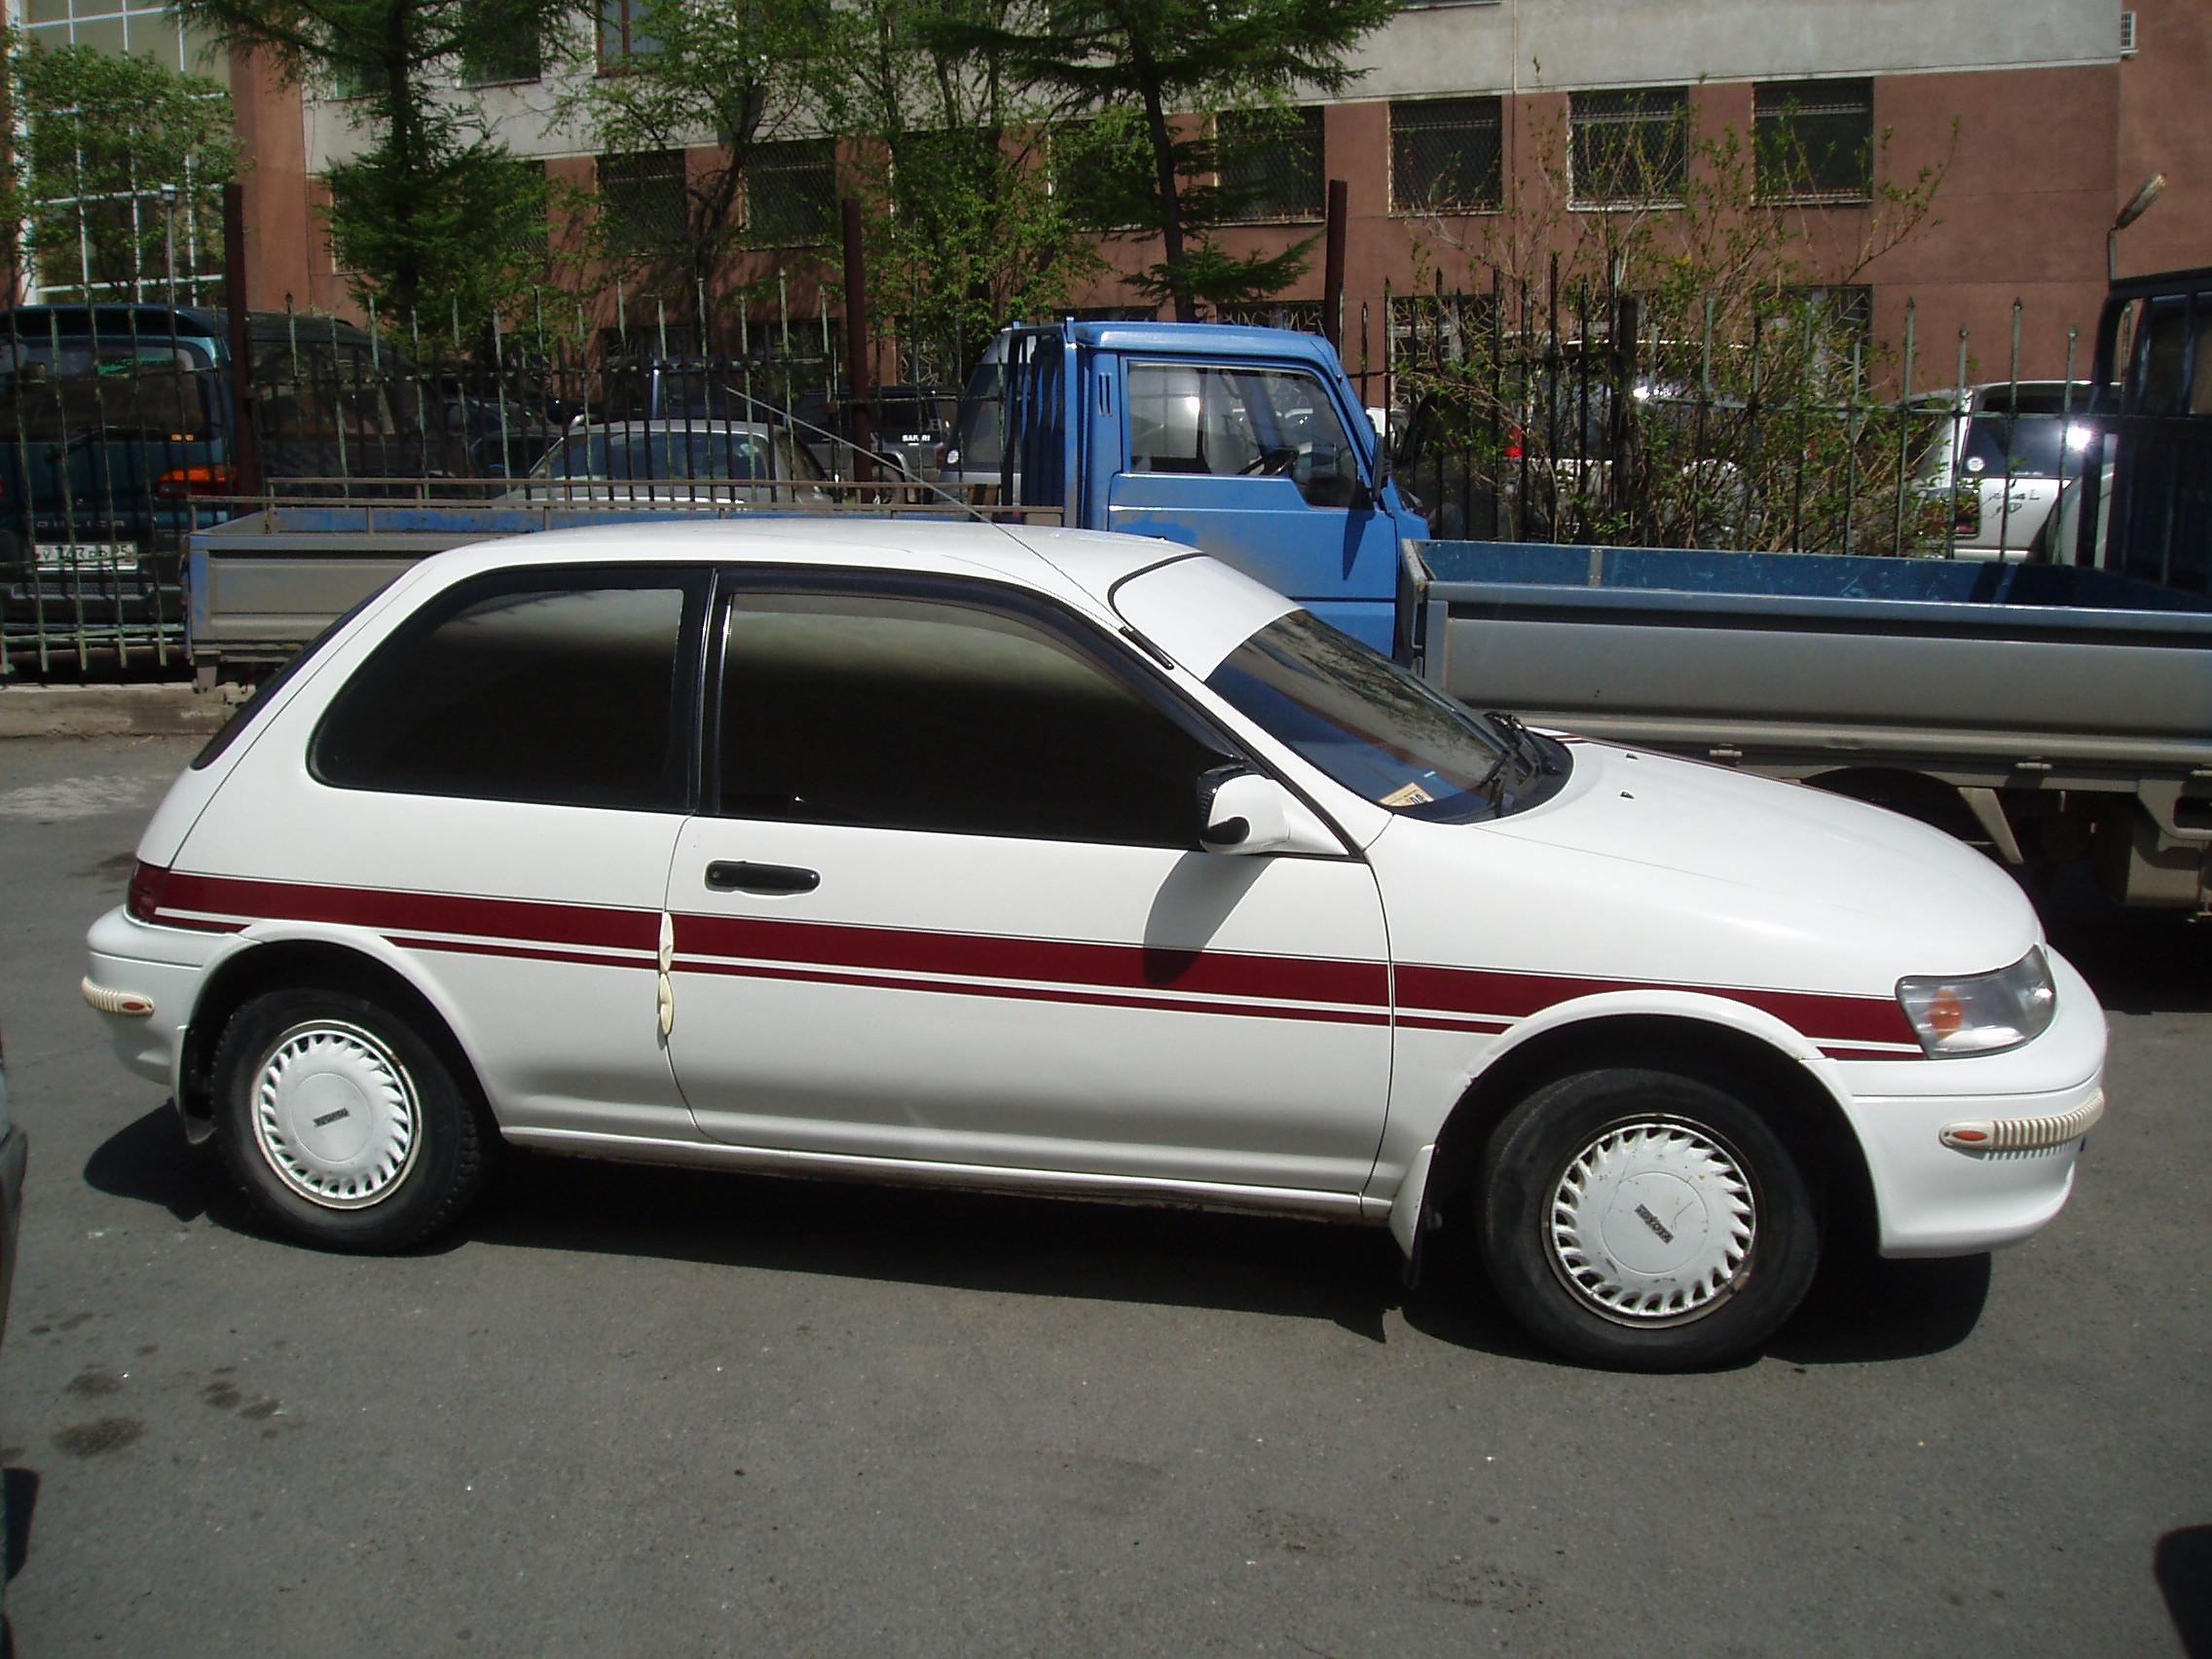 1993 Toyota Corolla Ii Pictures 1331cc Gasoline Ff